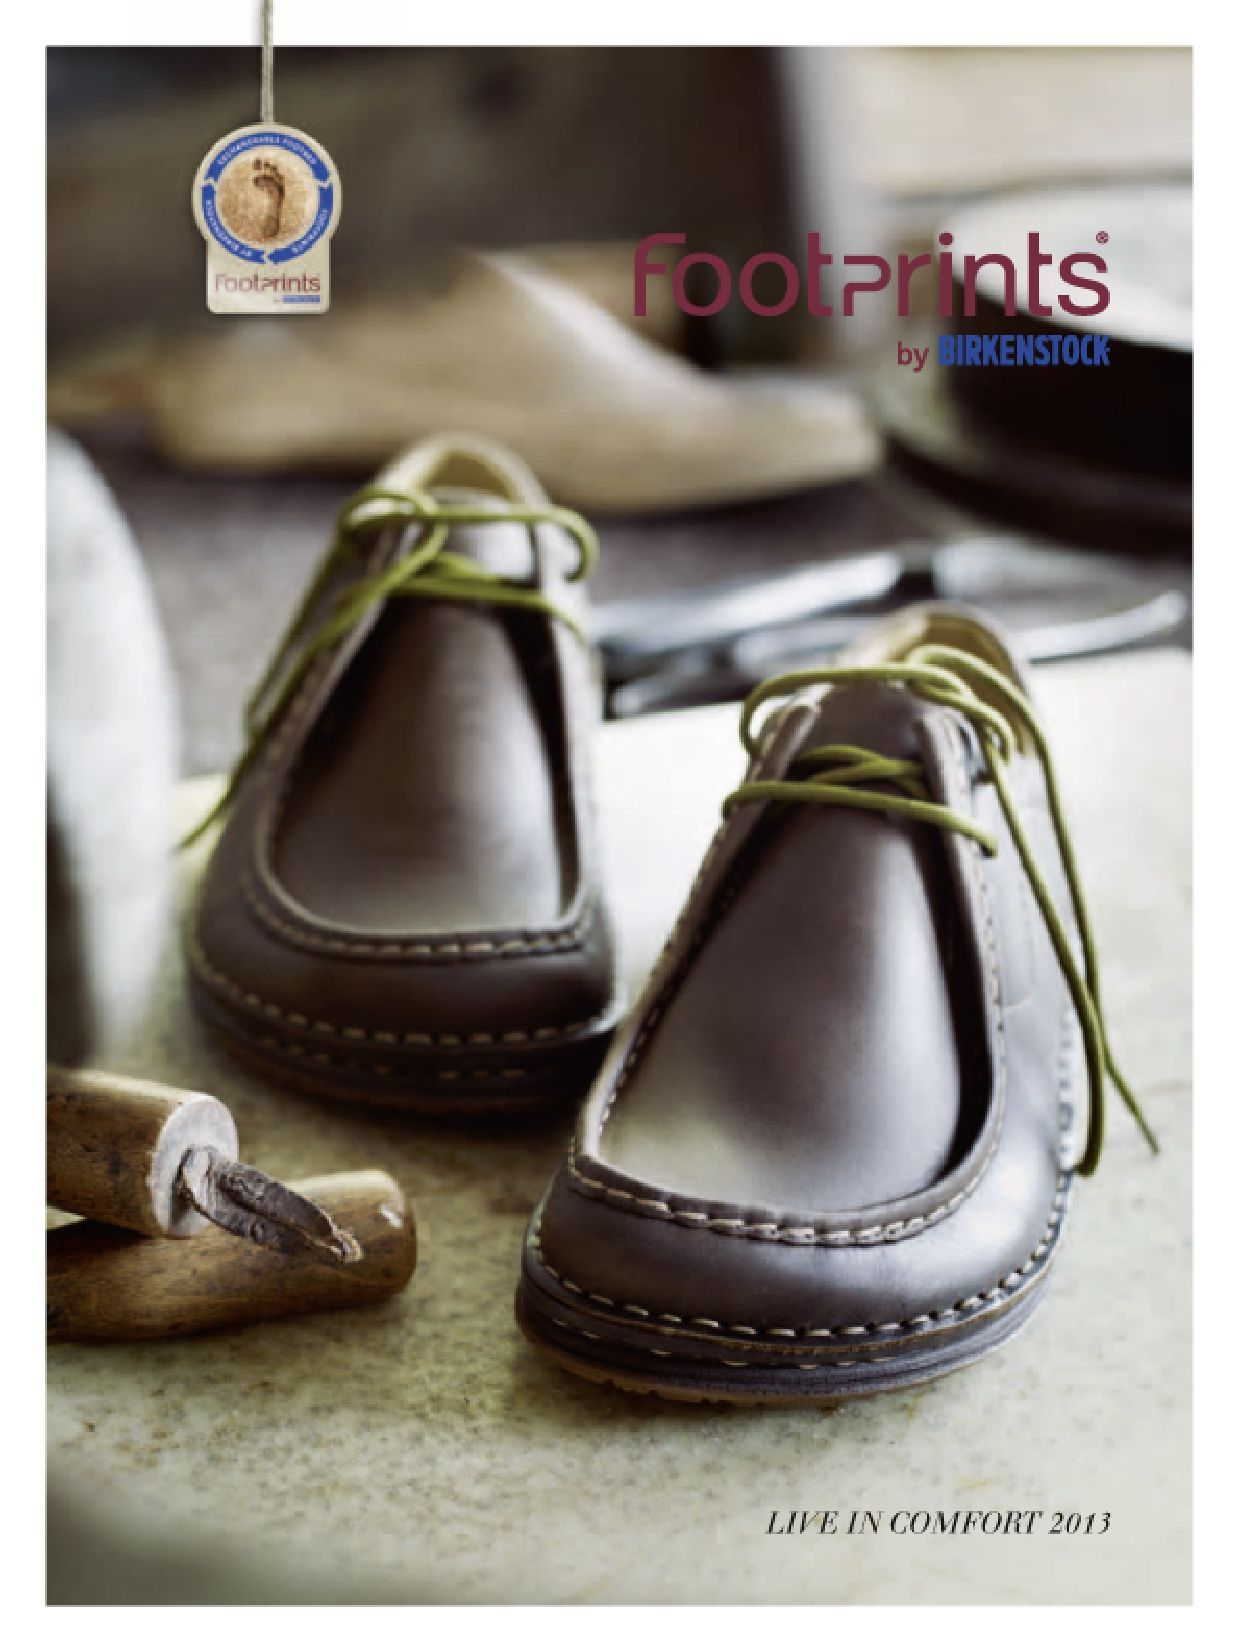 Footprints 2013